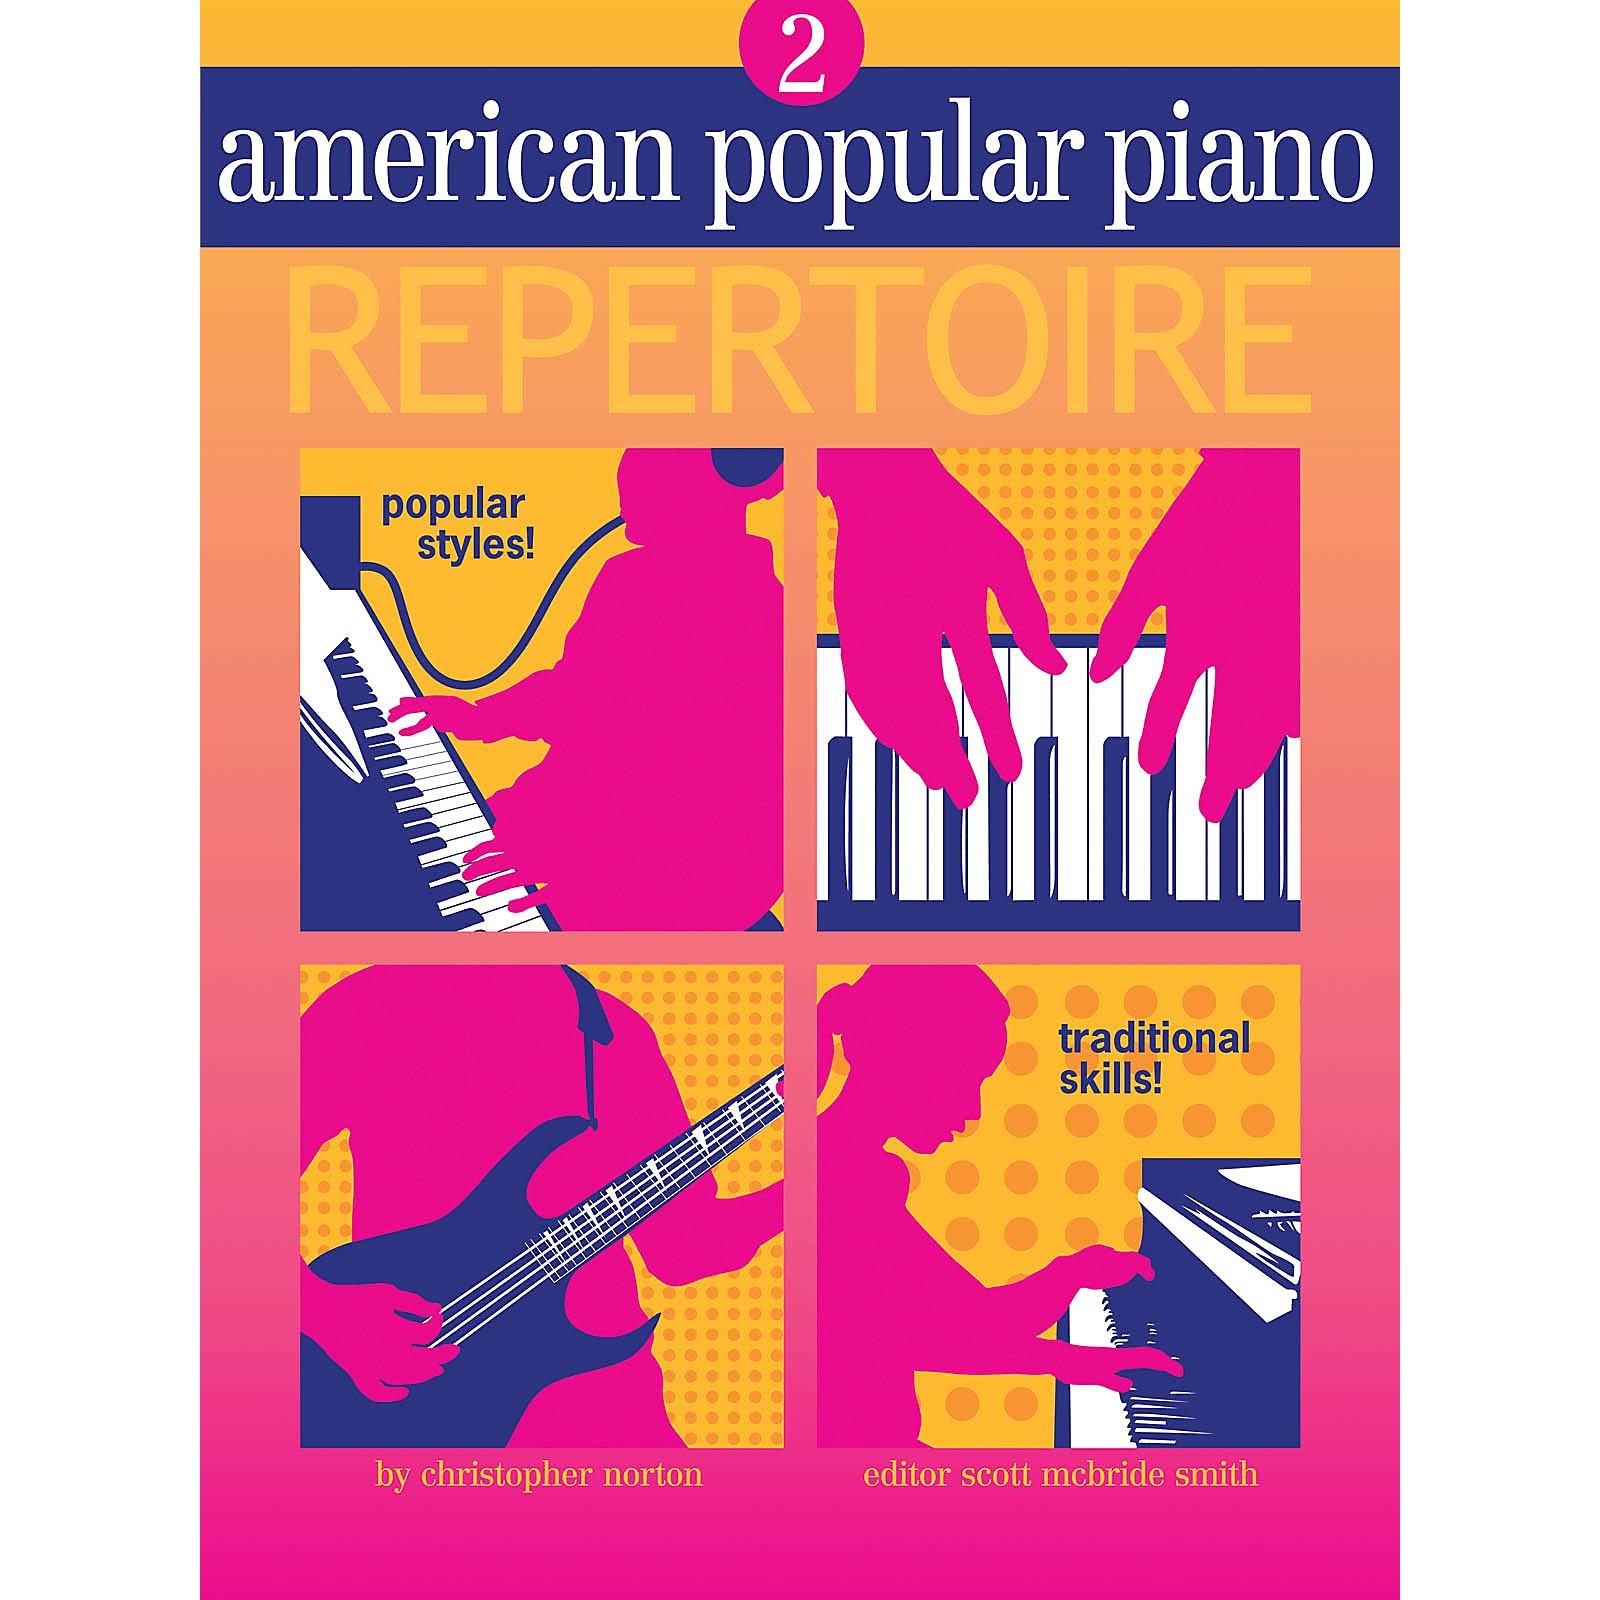 Novus Via American Popular Piano - Repertoire Novus Via Music Group Softcover Media Online by Christopher Norton